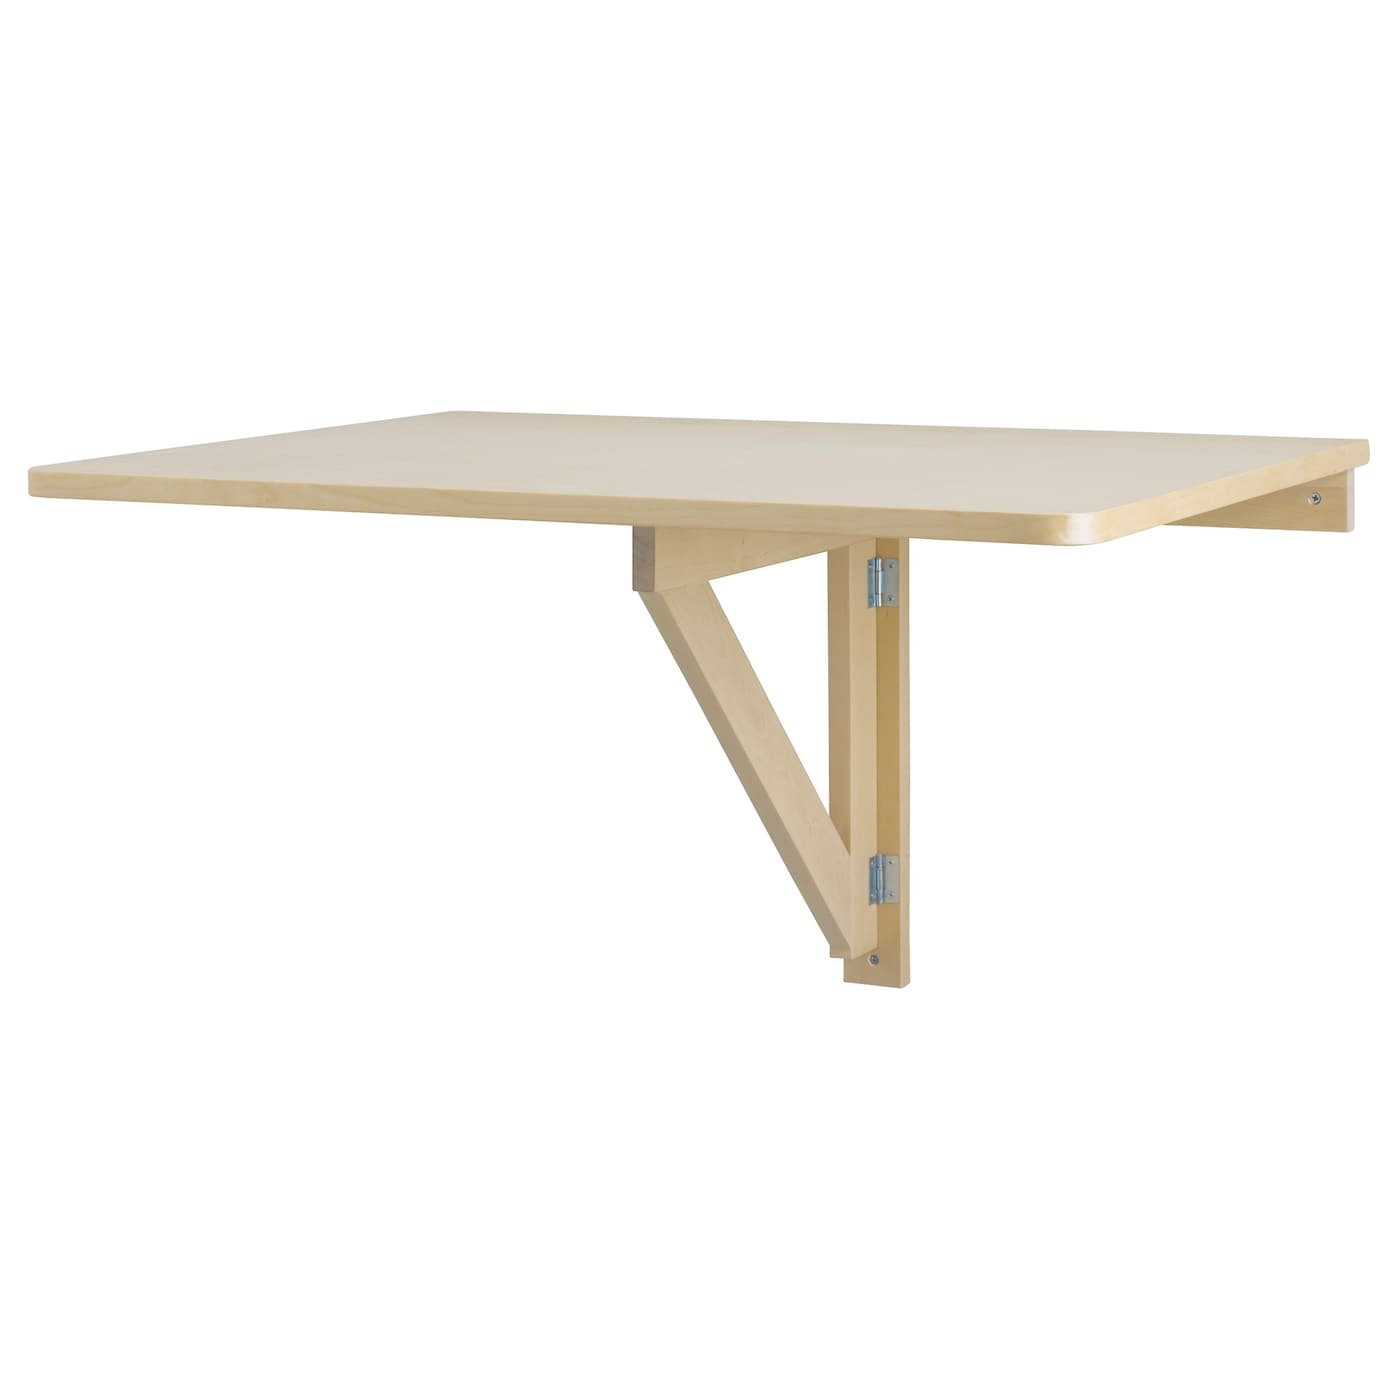 Mesas abatibles de pared | Mesas de comedor | Compra Online IKEA